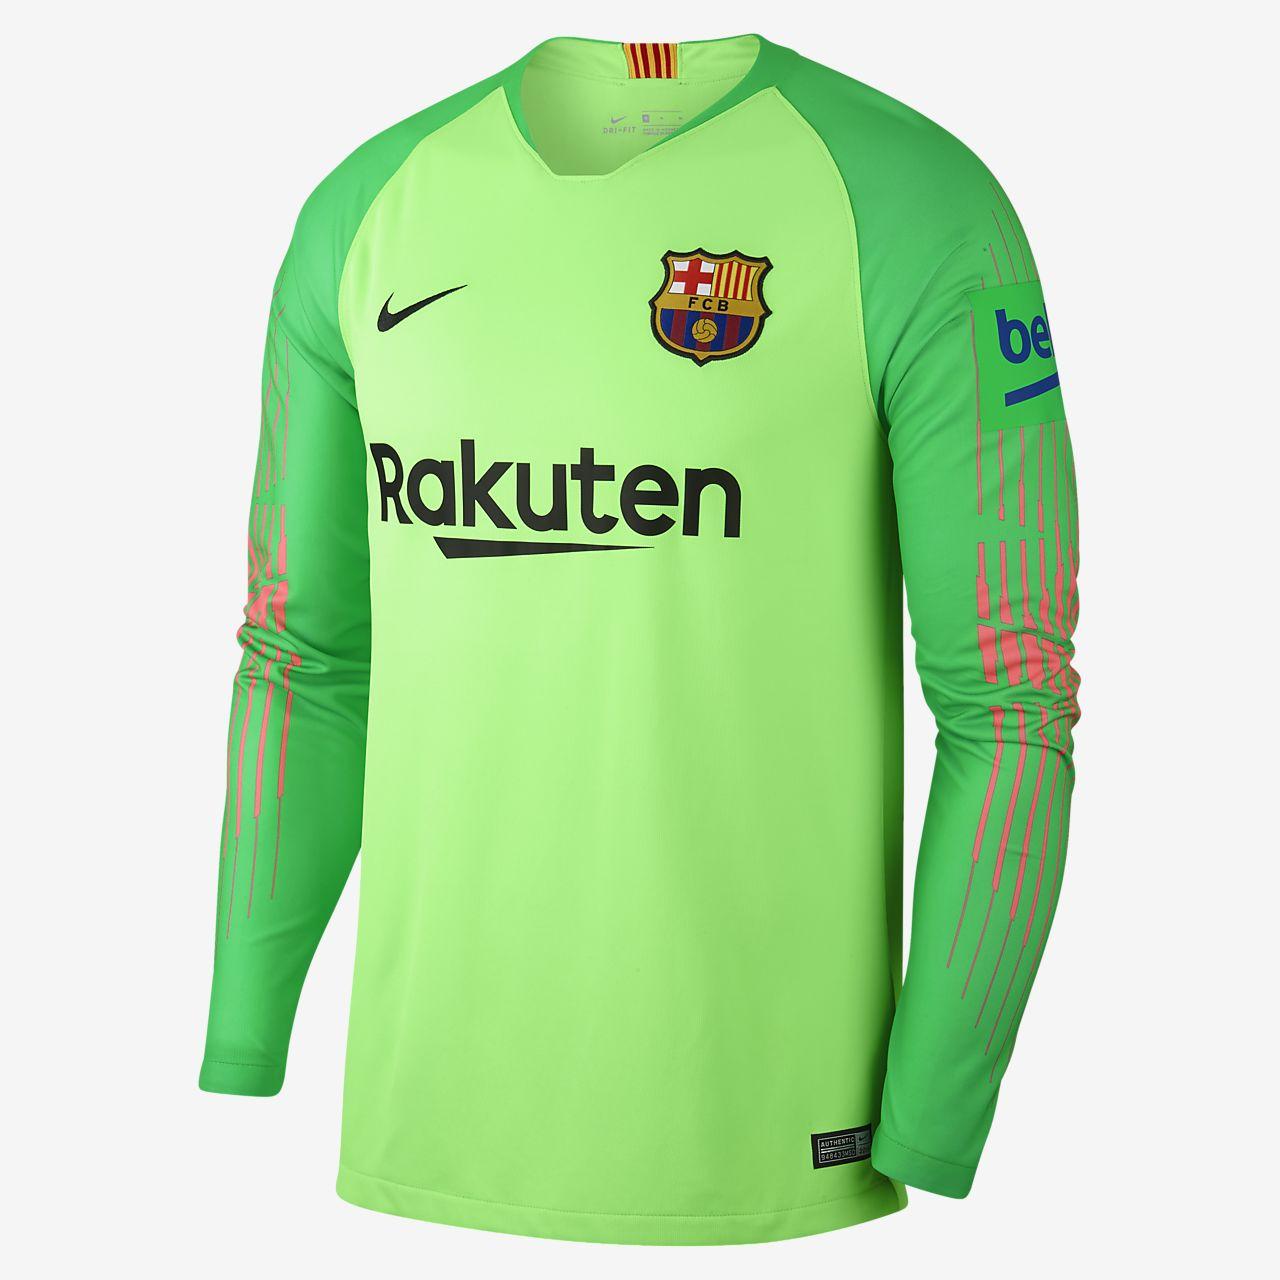 ee2fc3045 ... Camisola de futebol 2018 19 FC Barcelona Stadium Goalkeeper para homem